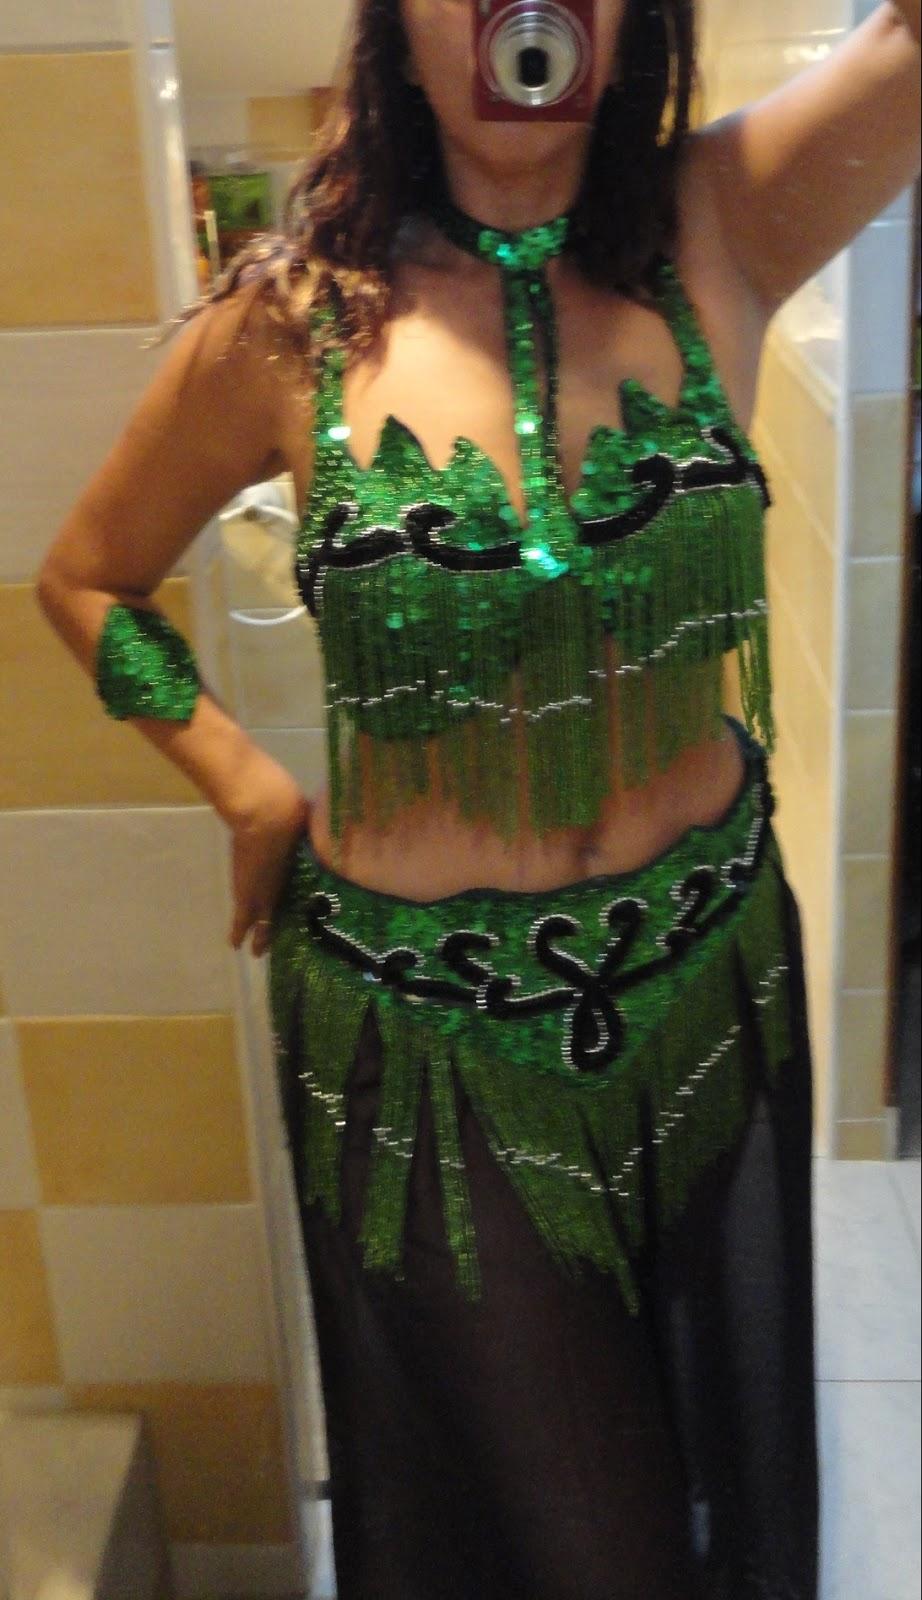 Miss coco vide son dressing montpellier h rault 34 ensemble vert emeraude de danse orientale - Vide dressing montpellier ...